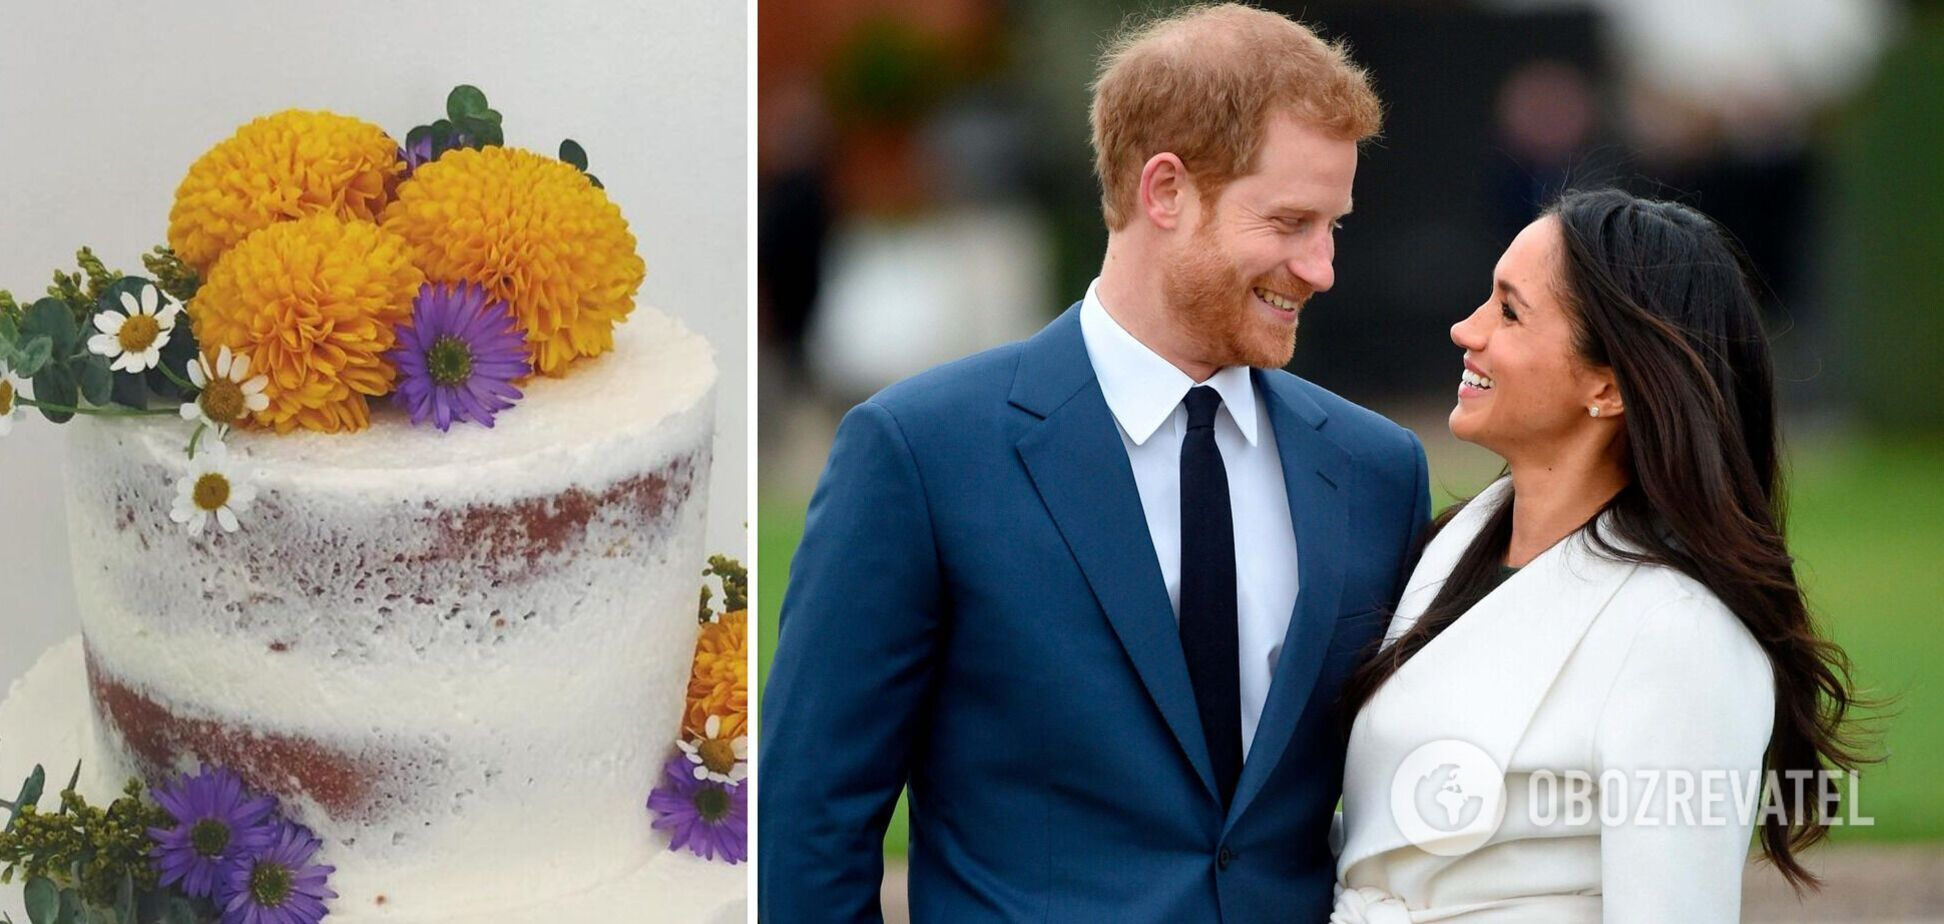 Принц Гарри заказал 'голый' торт для Меган Маркл